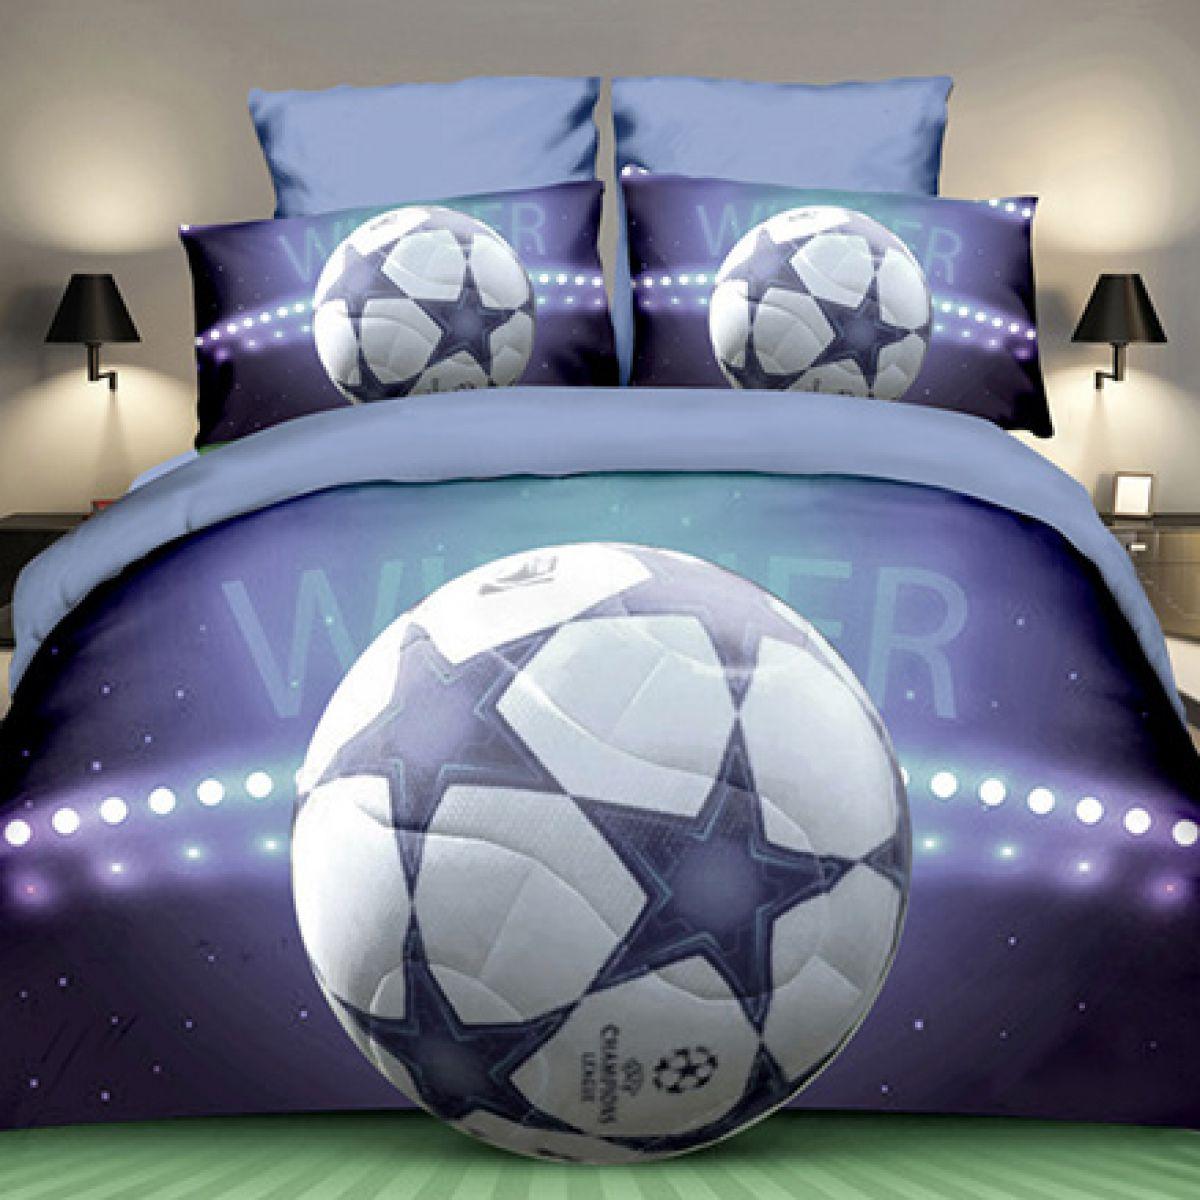 3D Beddings - Antonio - AML-309 - 160x200 cm - 4 pcs